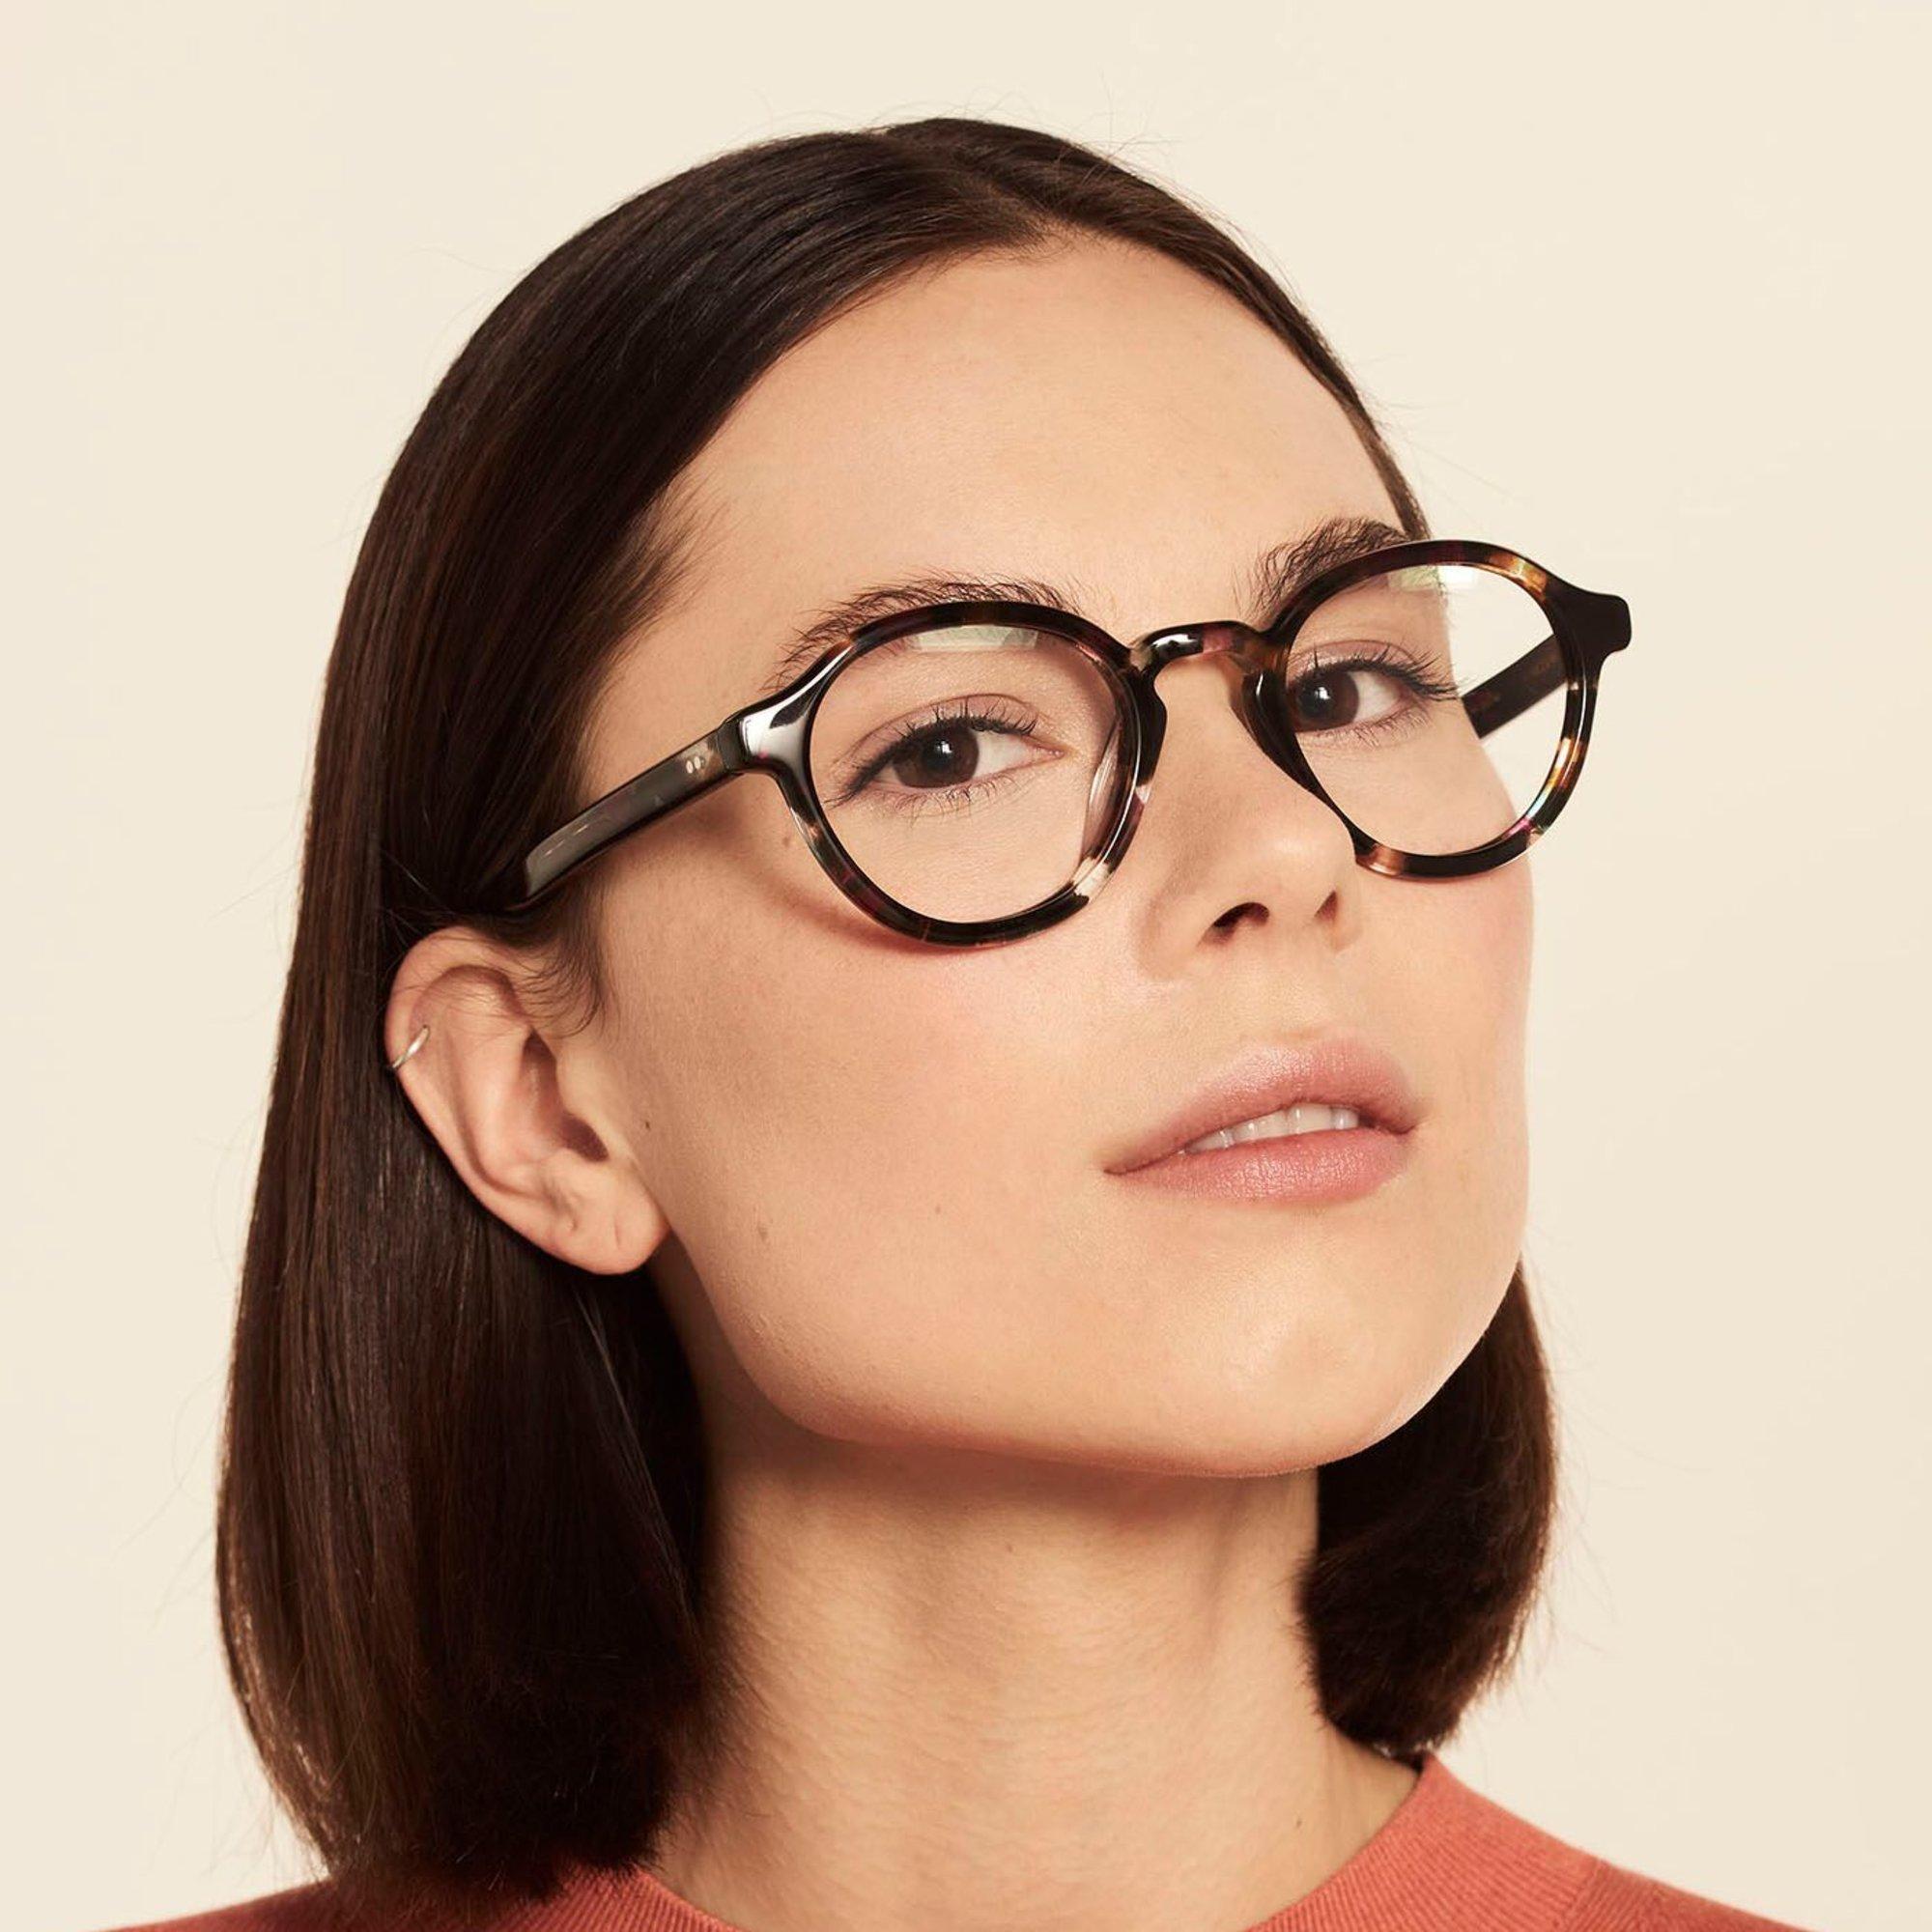 Ace & Tate Glasses | rund Acetat in Braun, Schwarz, Blau, Pink